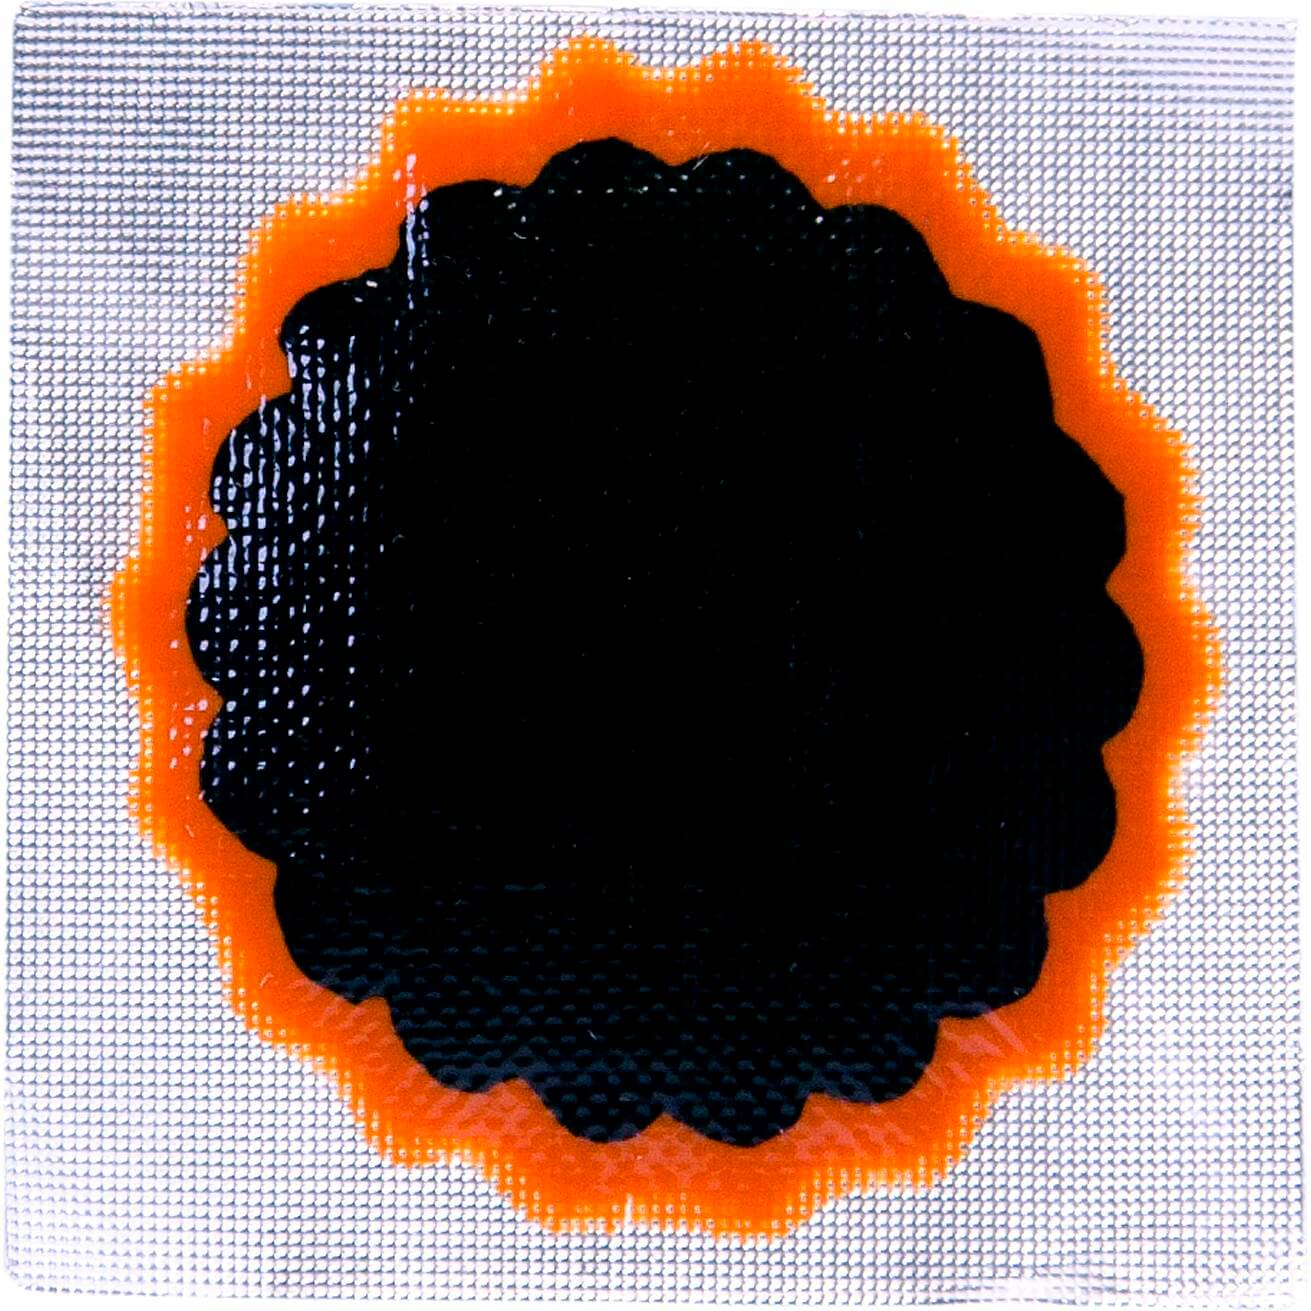 ds Tip-Top pleister no 1 35mm p/30